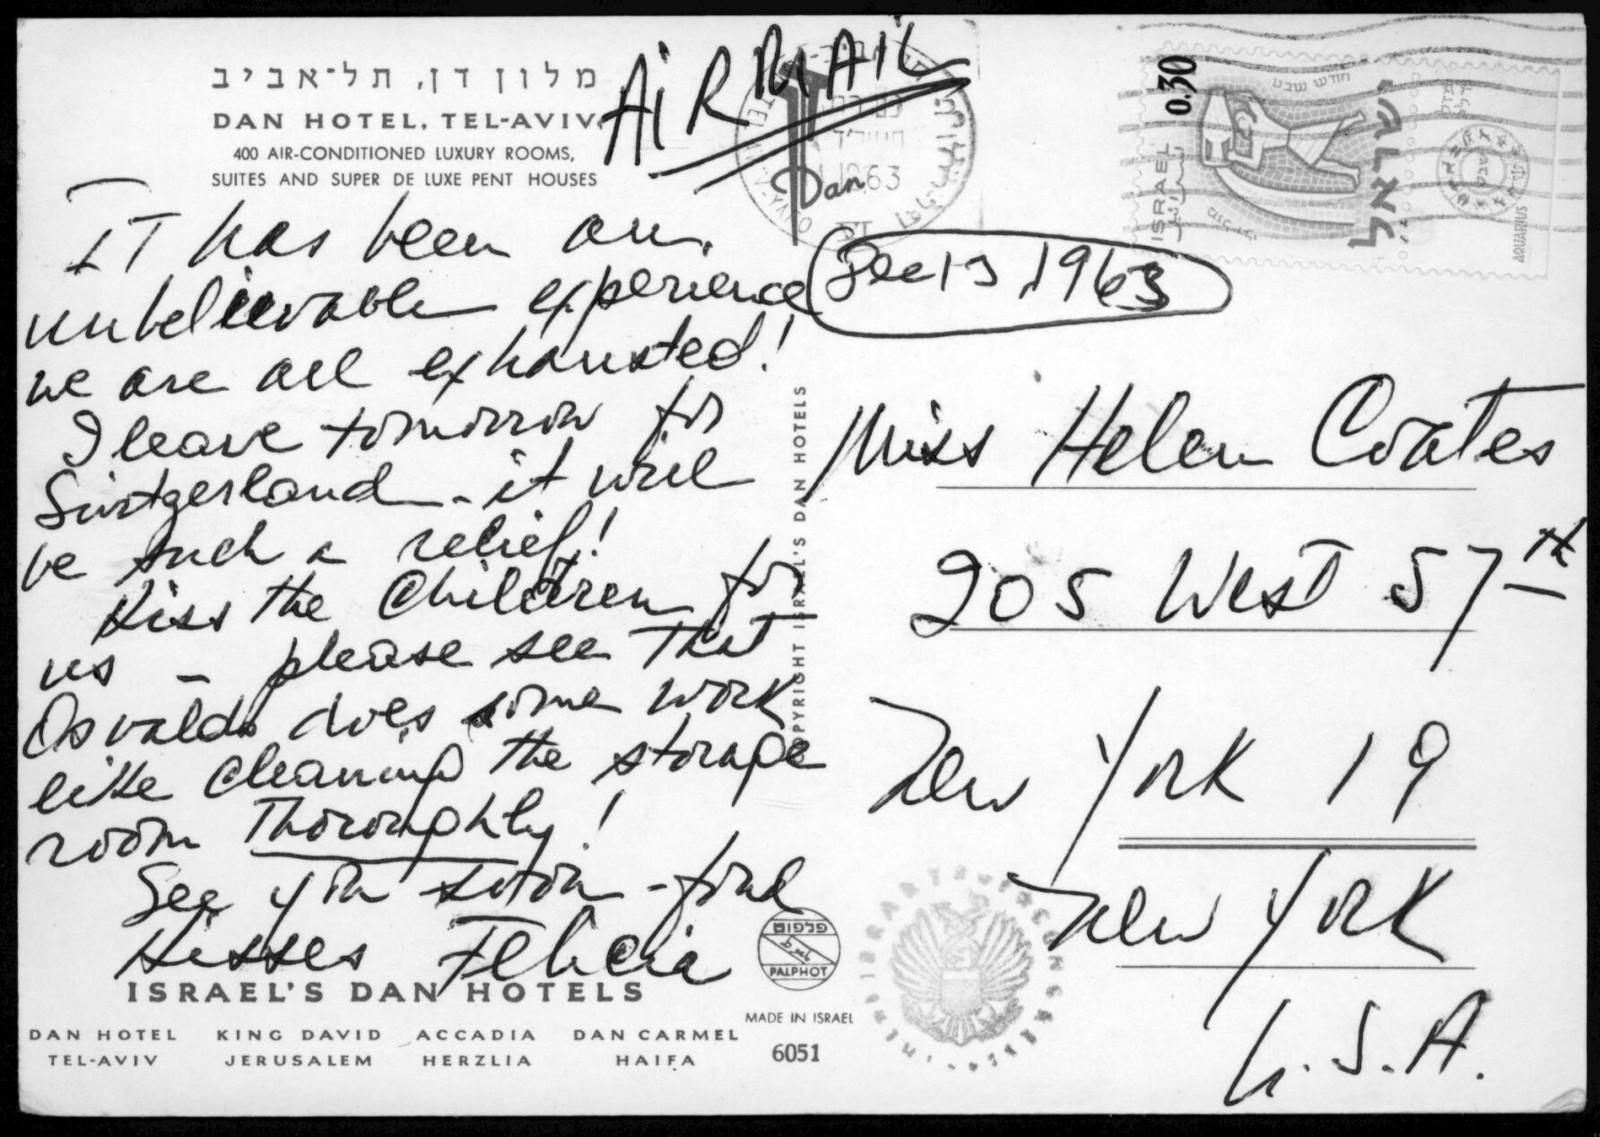 Letter from Felicia Bernstein to Helen Coates, December 13, 1963